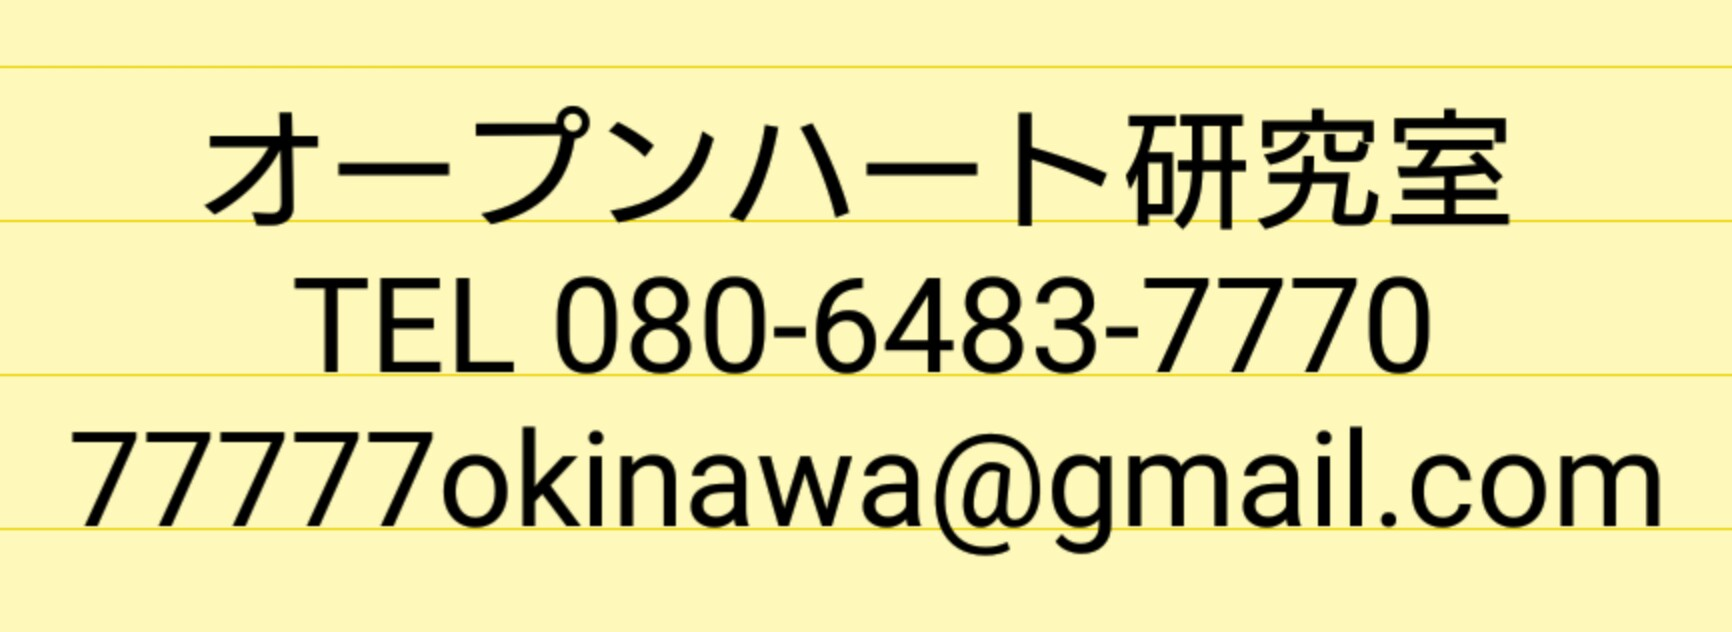 20200203205202e38.jpg